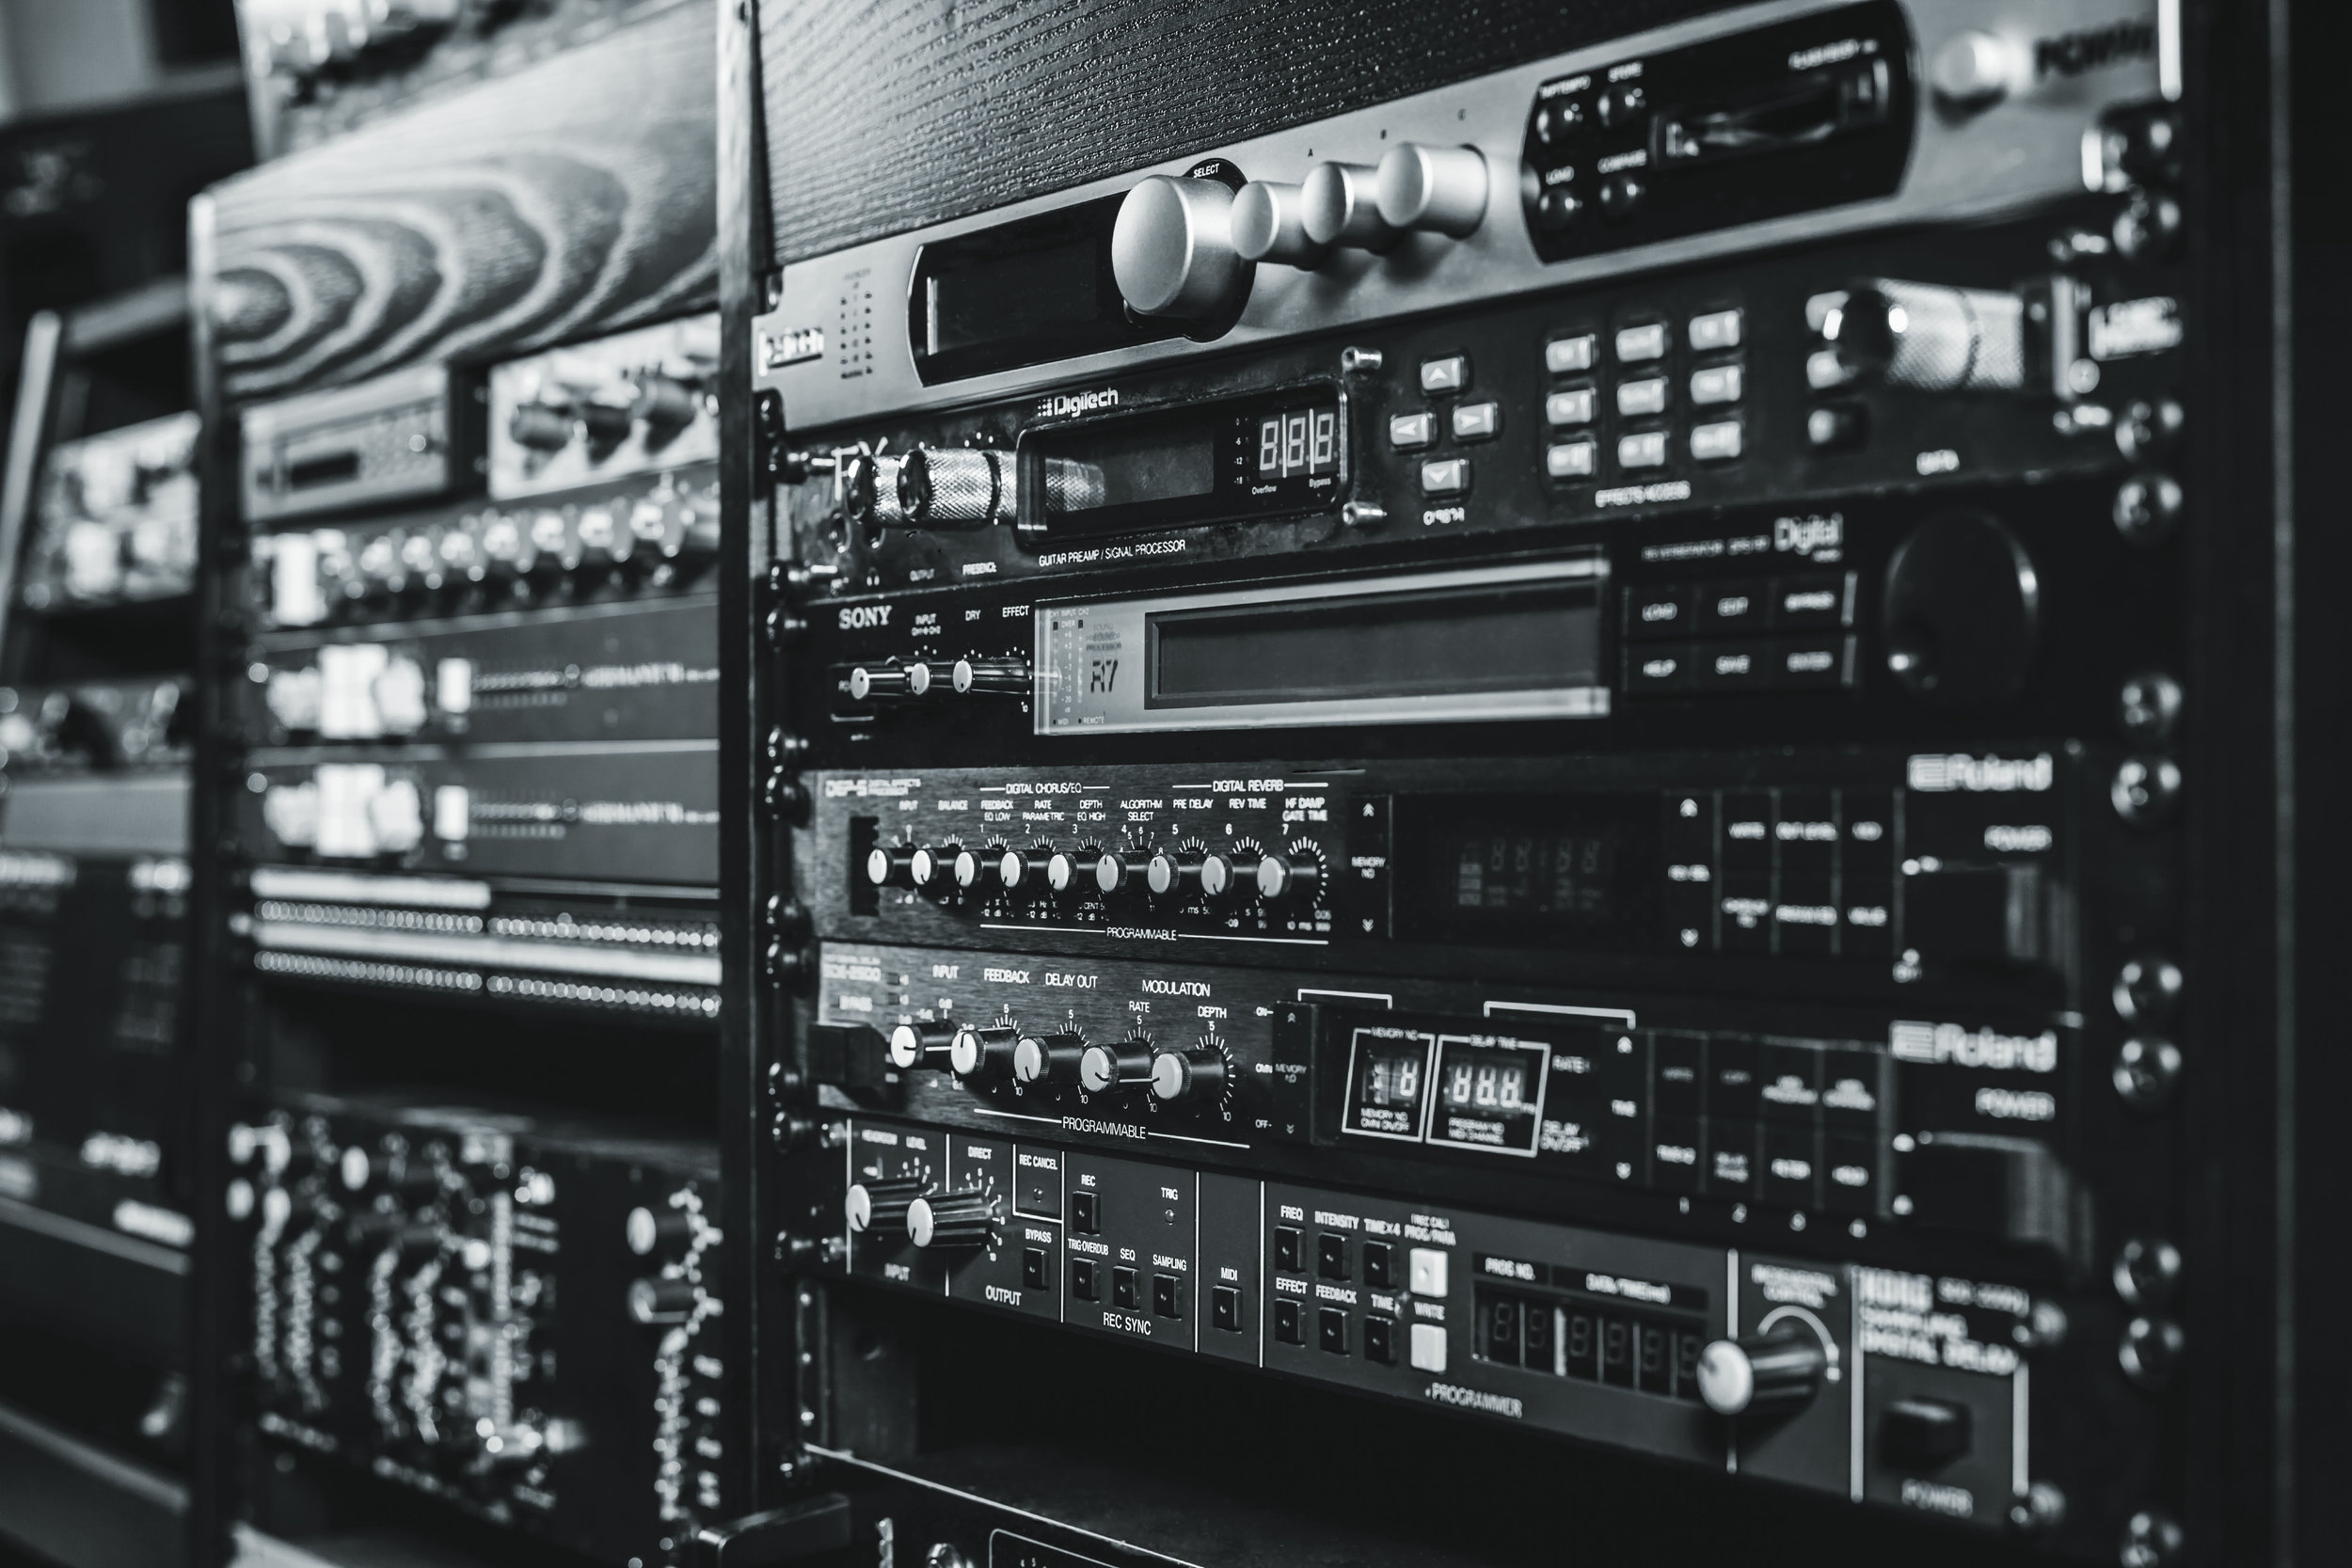 032617_Helio_Sound_studio2881_L_BW.jpg